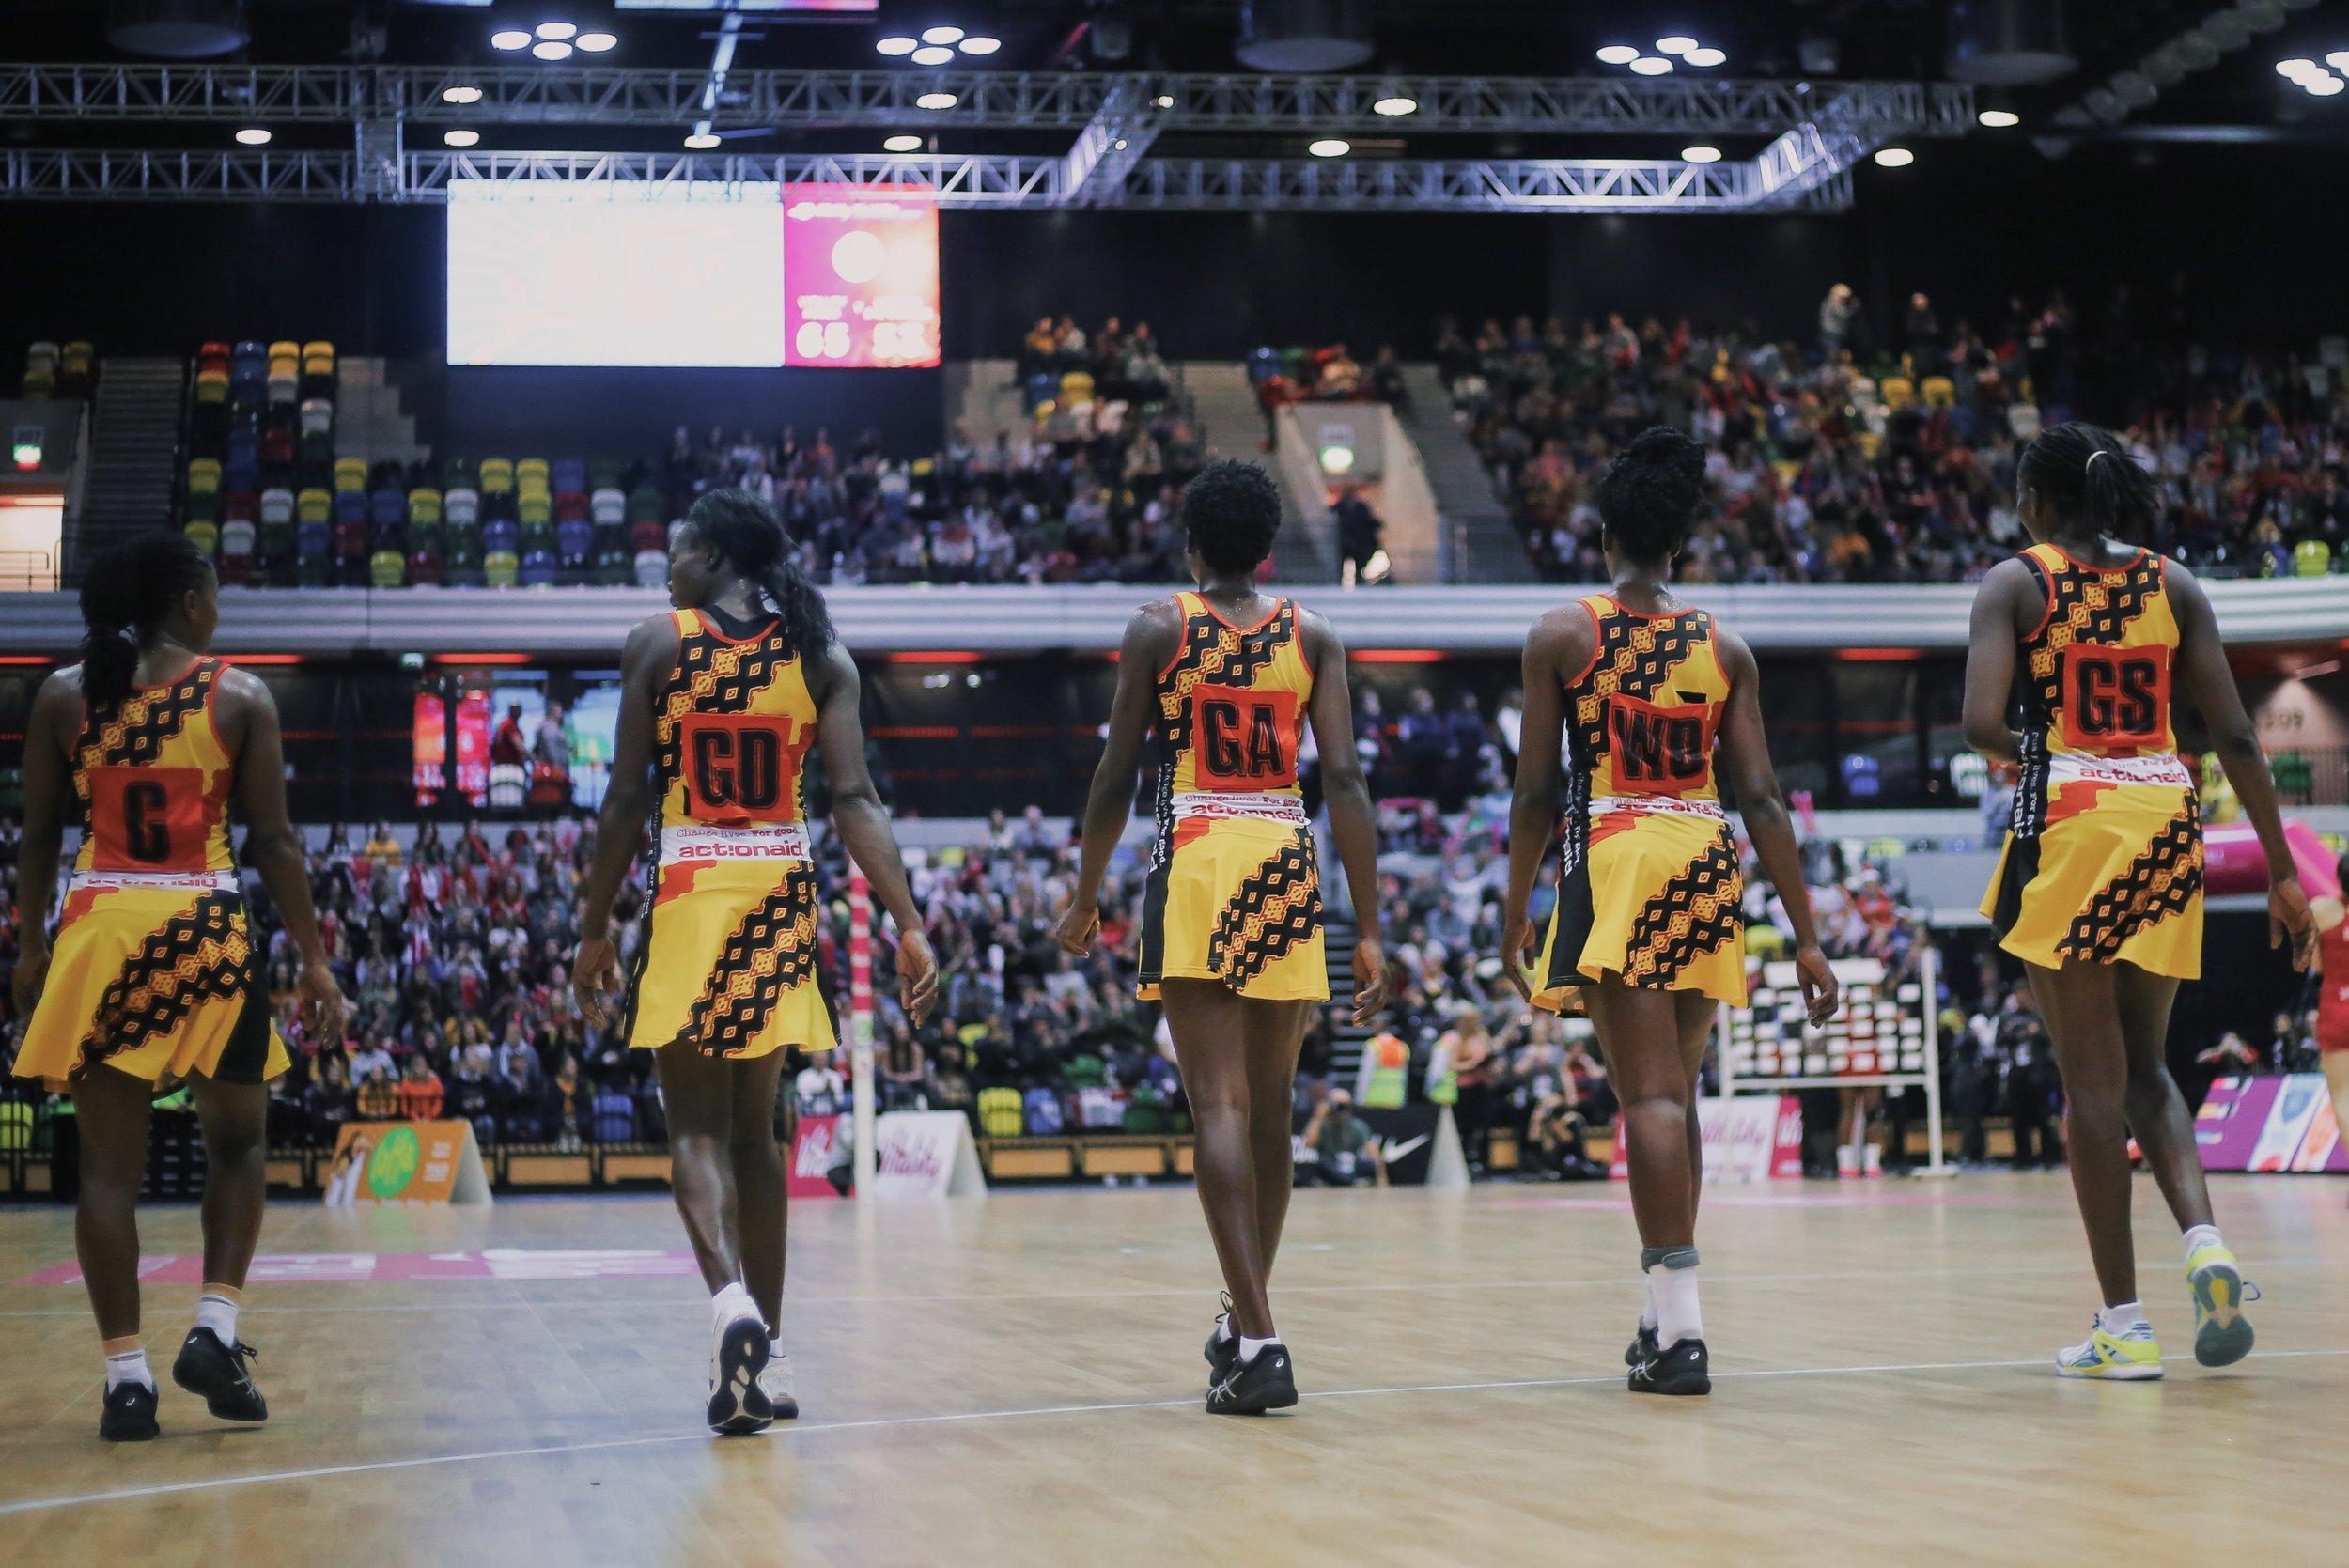 womens-netball-sport-england-uganda-international-series-29.jpg